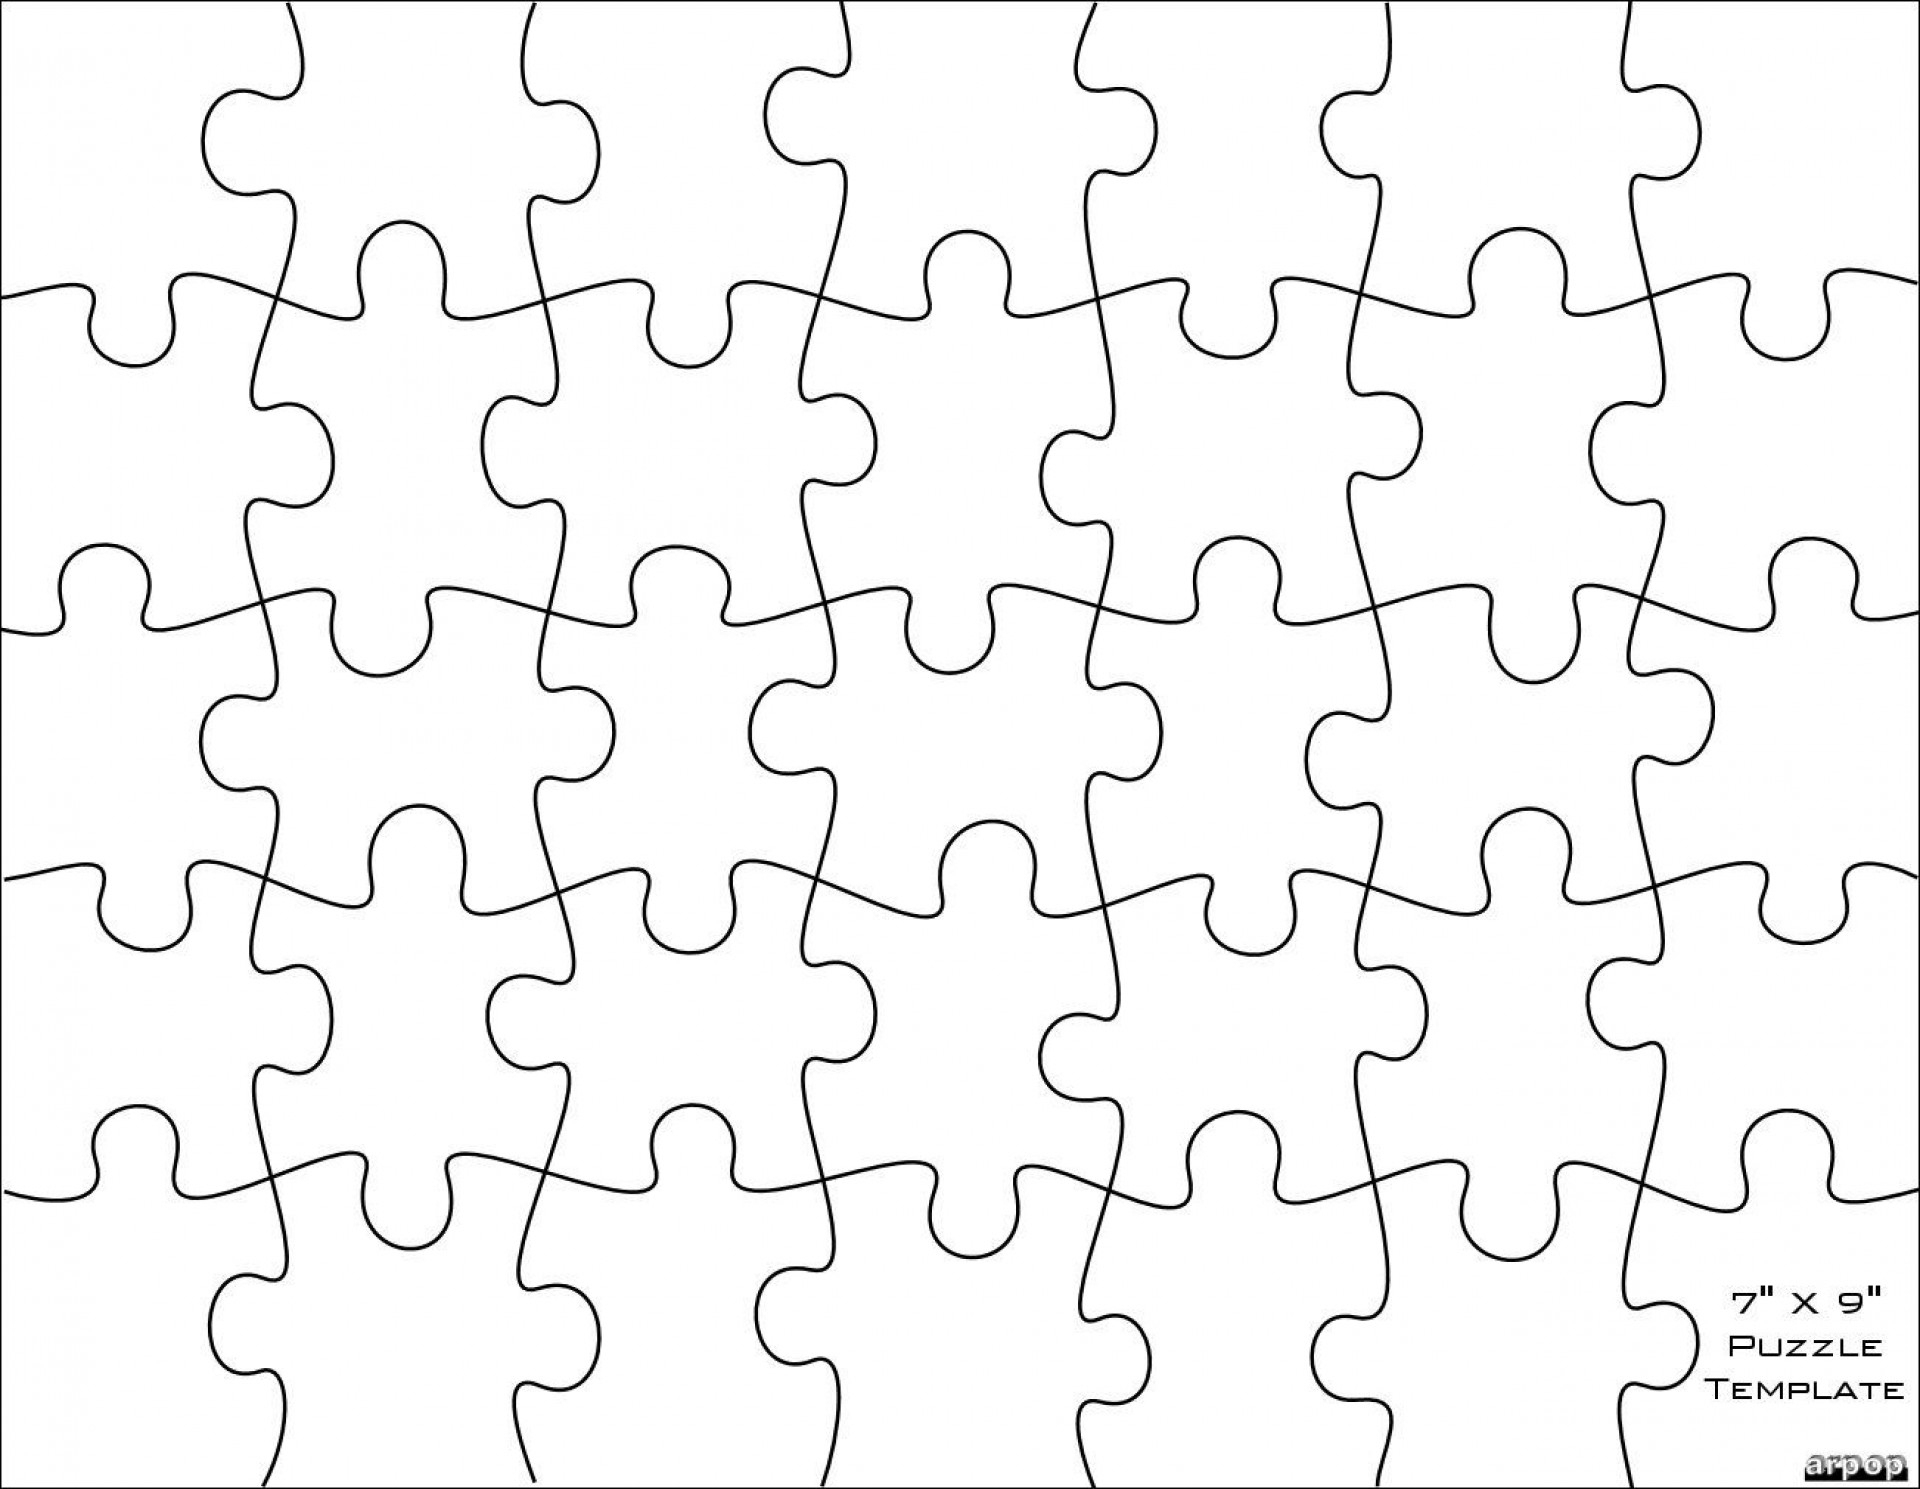 006 Jigsaw Puzzle Blank Template Twenty Pieces Simple Jig Saw - Printable Jigsaw Puzzle Generator